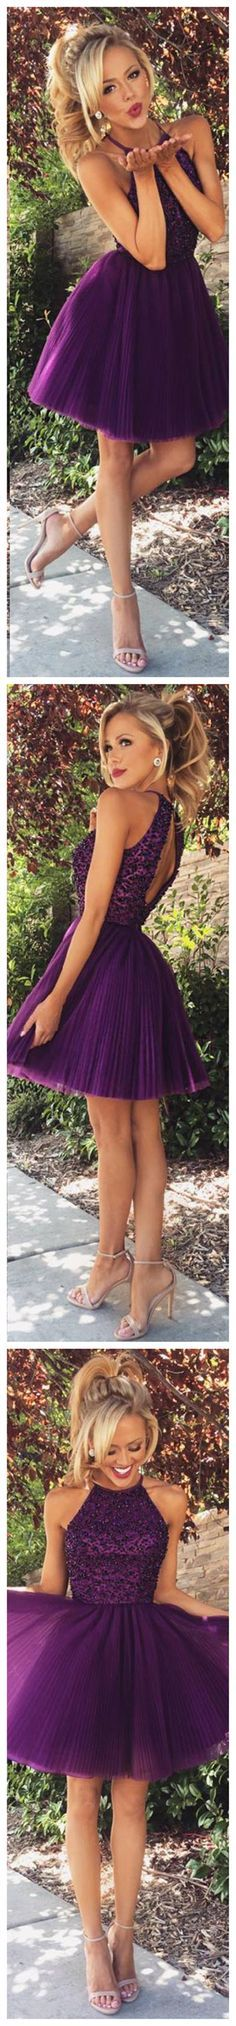 Purple High Neck open back homecoming dress,short prom dress